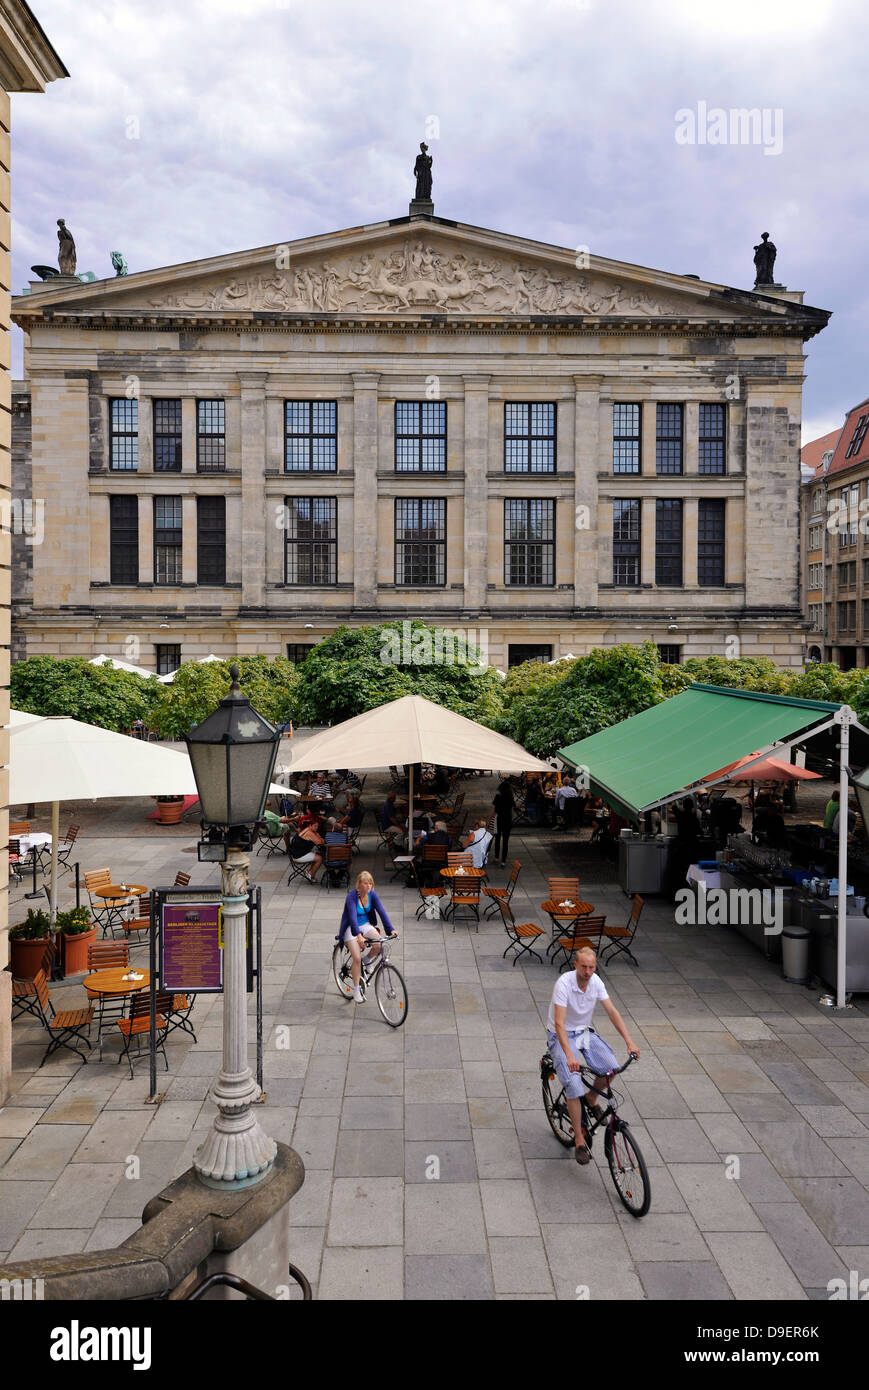 Concert hall, Schinkelbau, Caf ? ?, Touristen, gendarme's market, district middle, Berlin, Germany, Europe - Stock Image